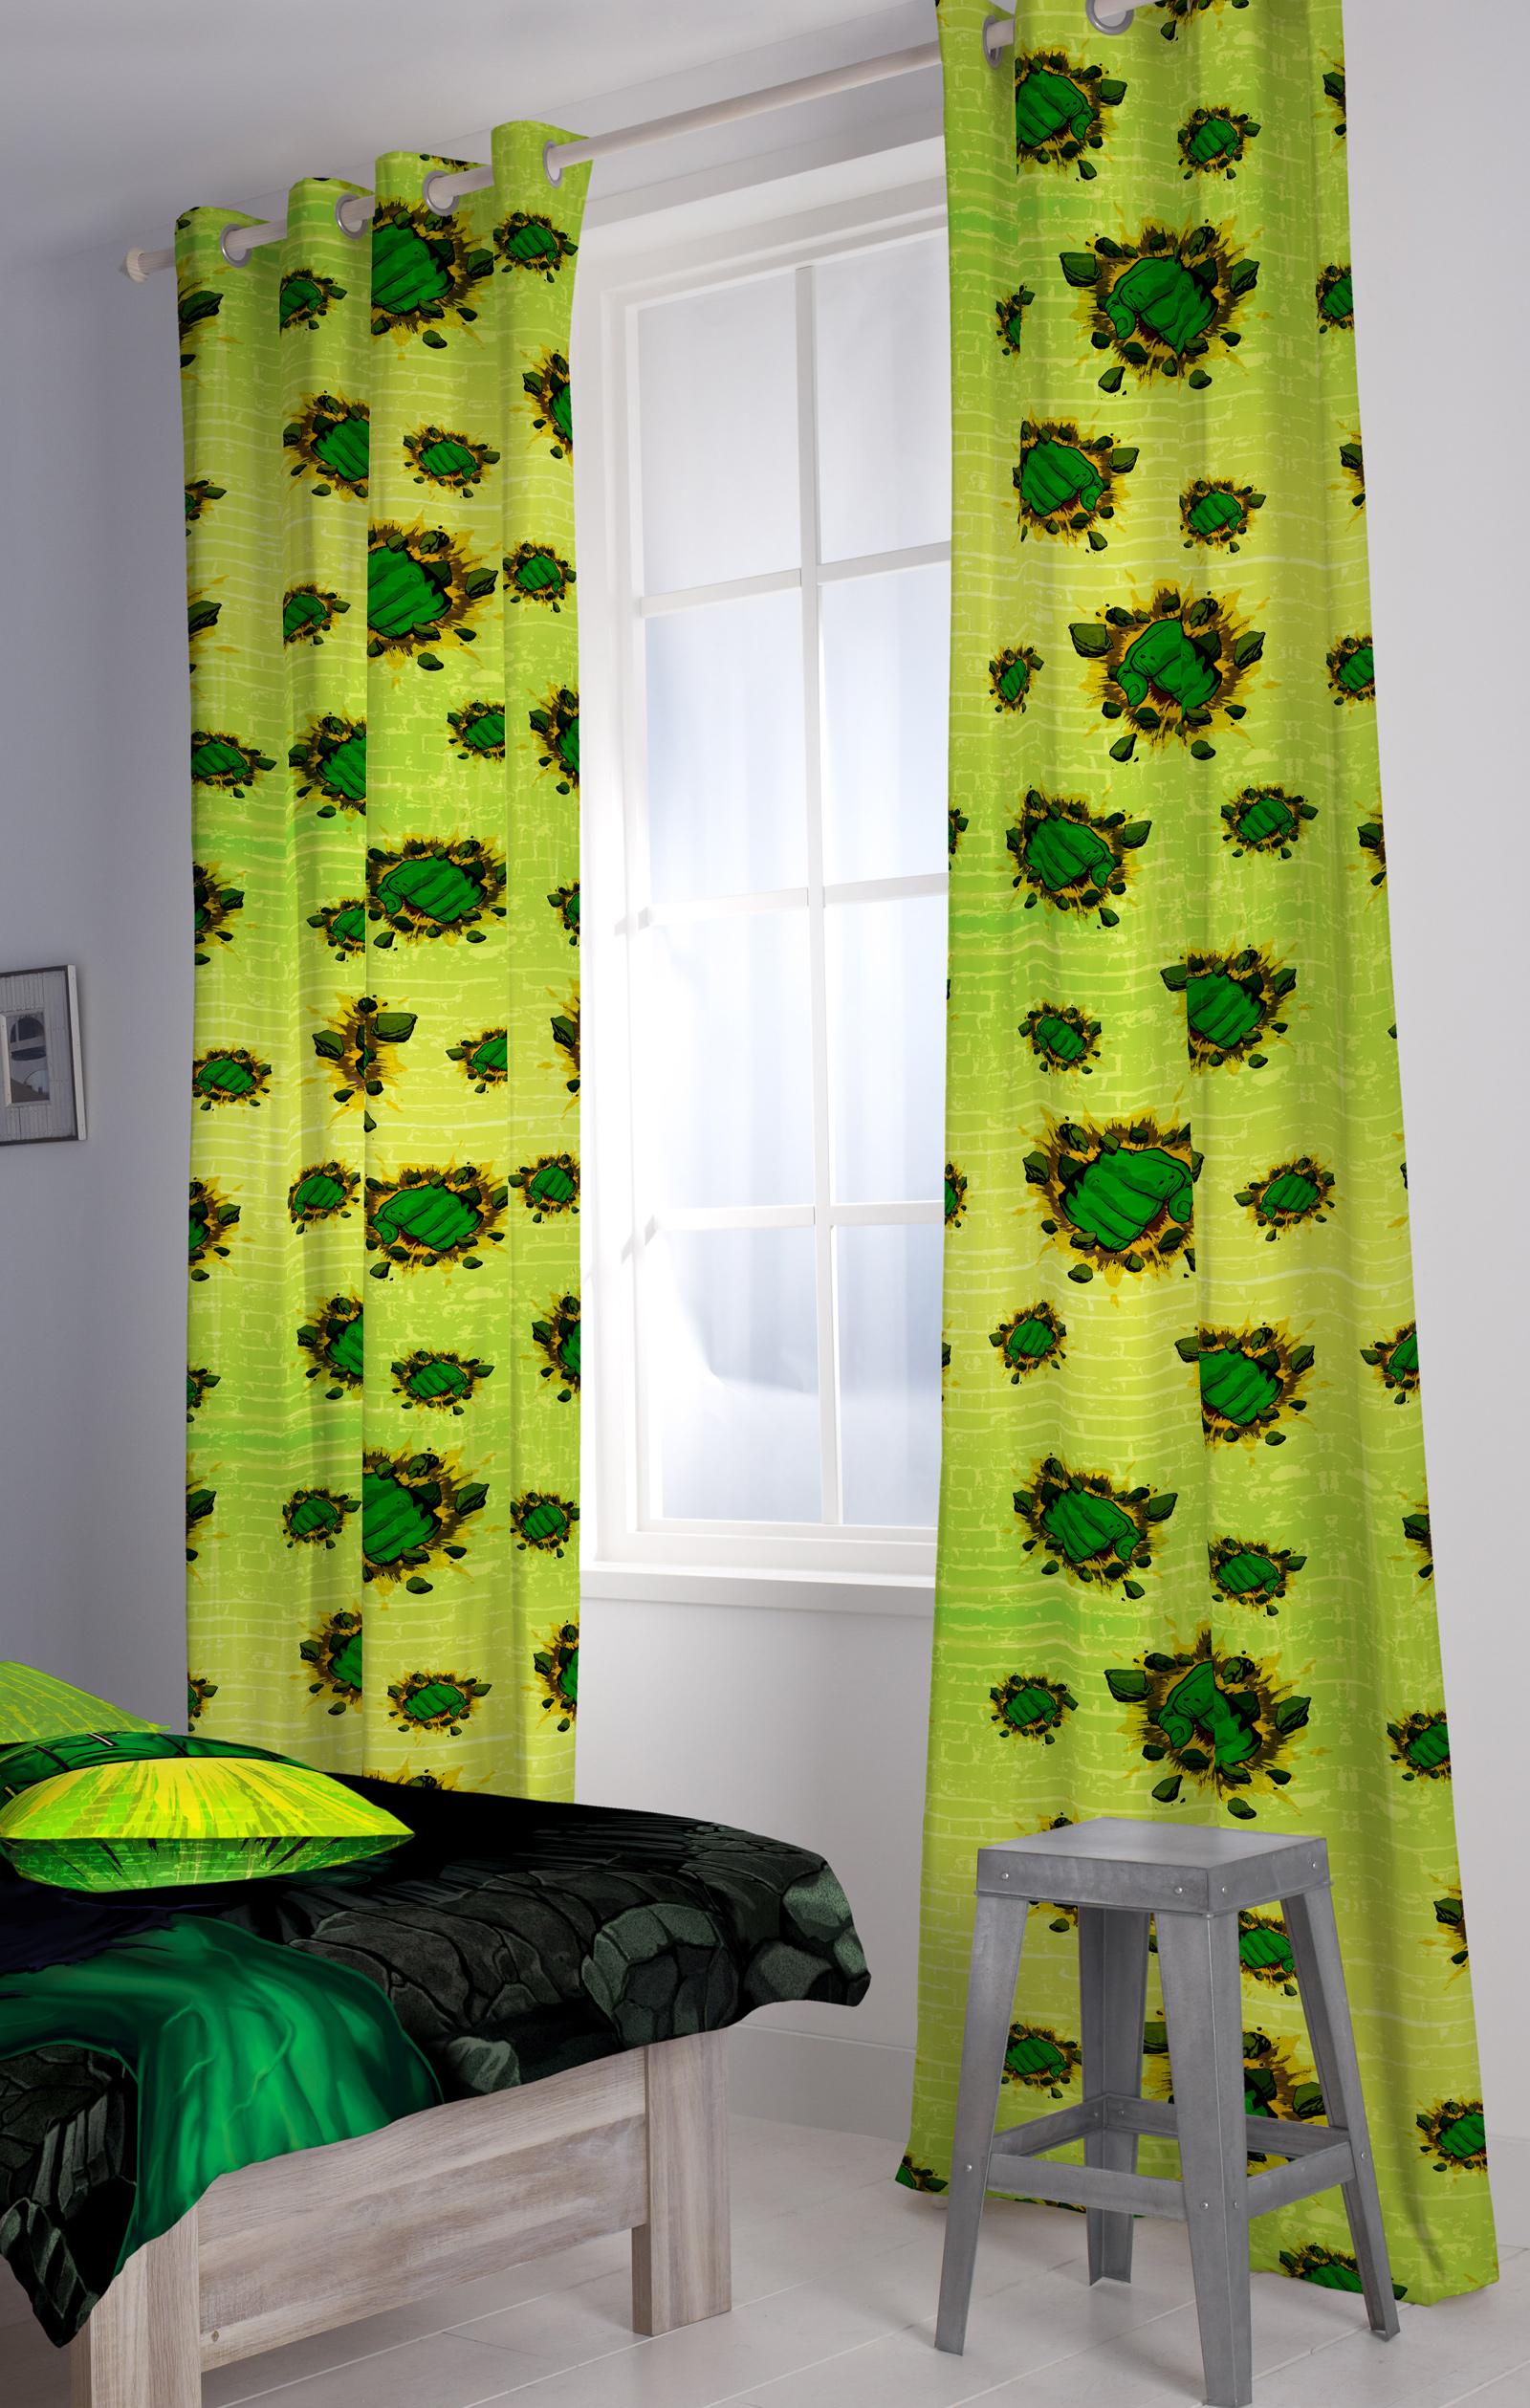 D Decor The Incredible Hulk Door Curtain Price In India On 14 April 2013 In Mumbai Delhi Bangalore Kolkata Chennai Hyderabad